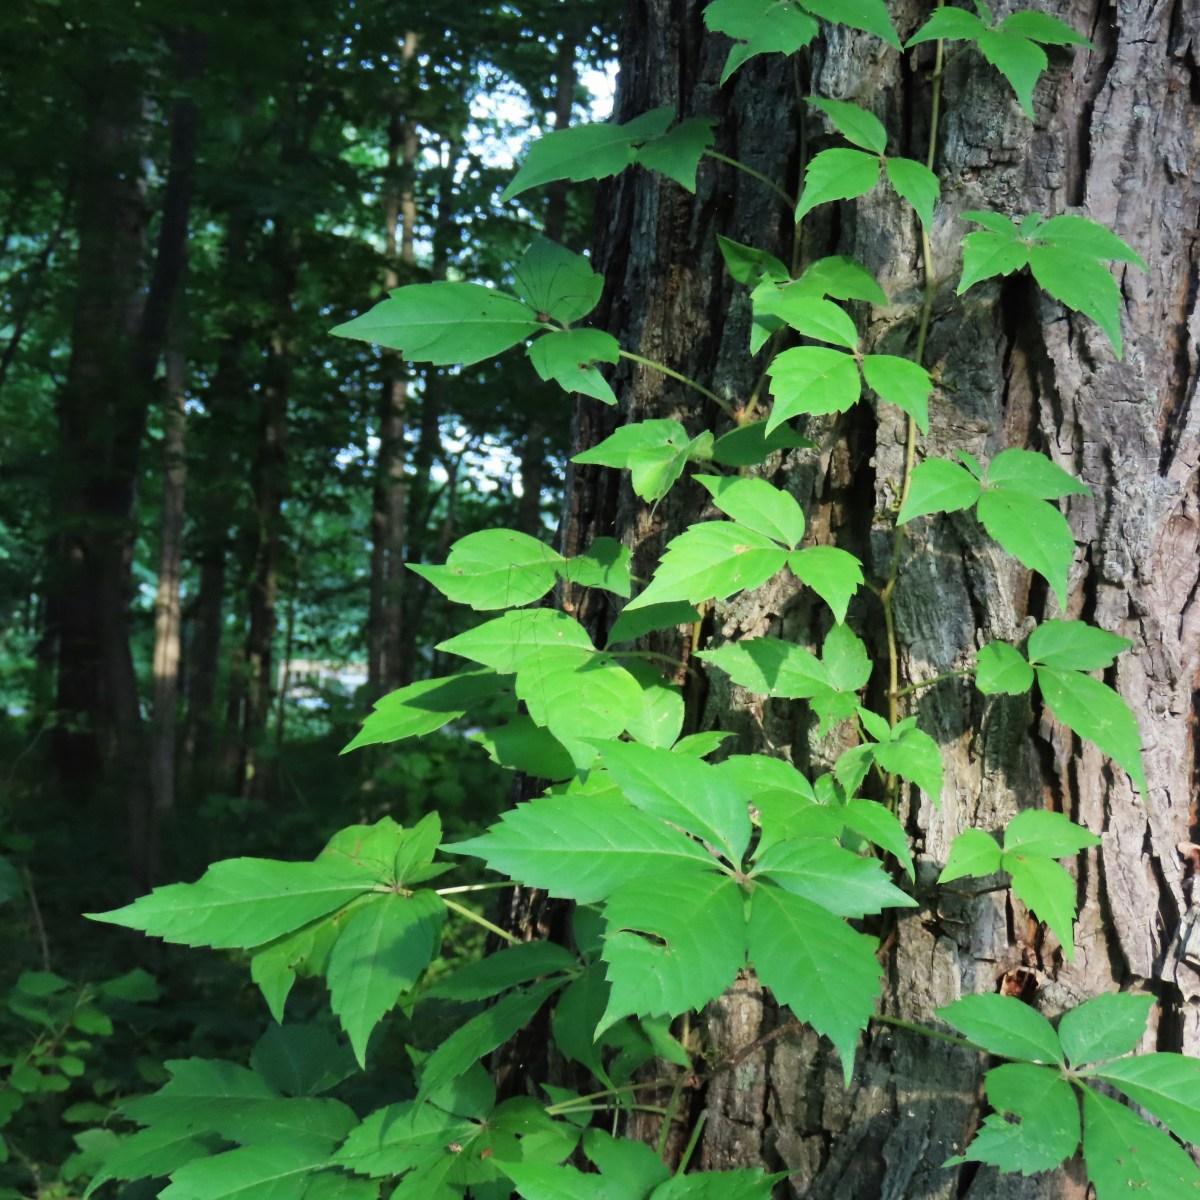 Virginia creeper on tree trunk